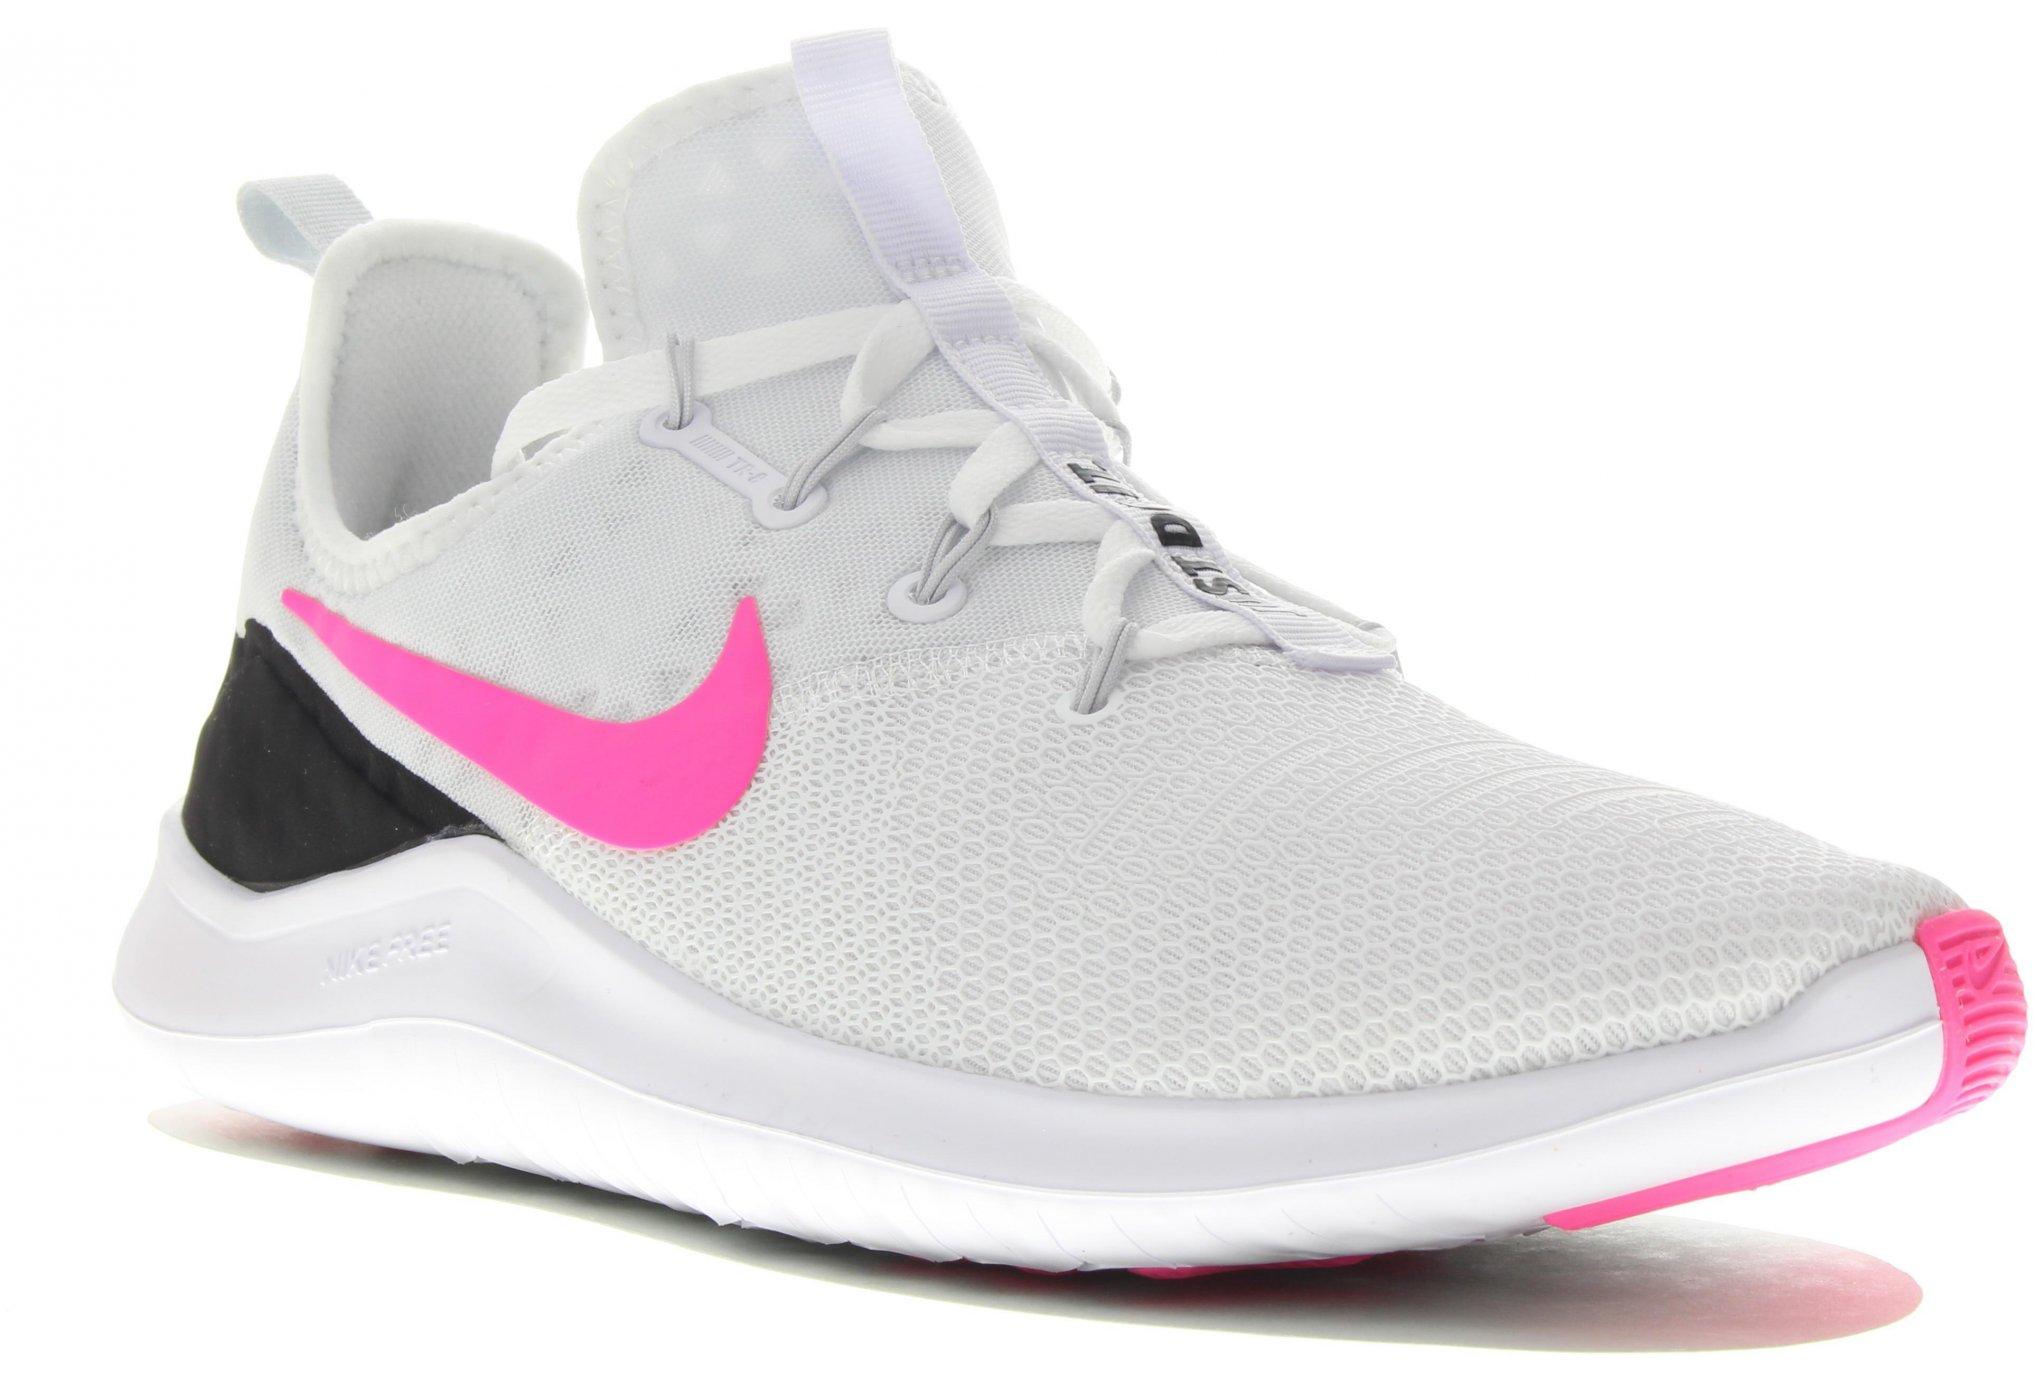 competitive price c2a26 53927 Nike Air Max Fit W femme Noir pas cher